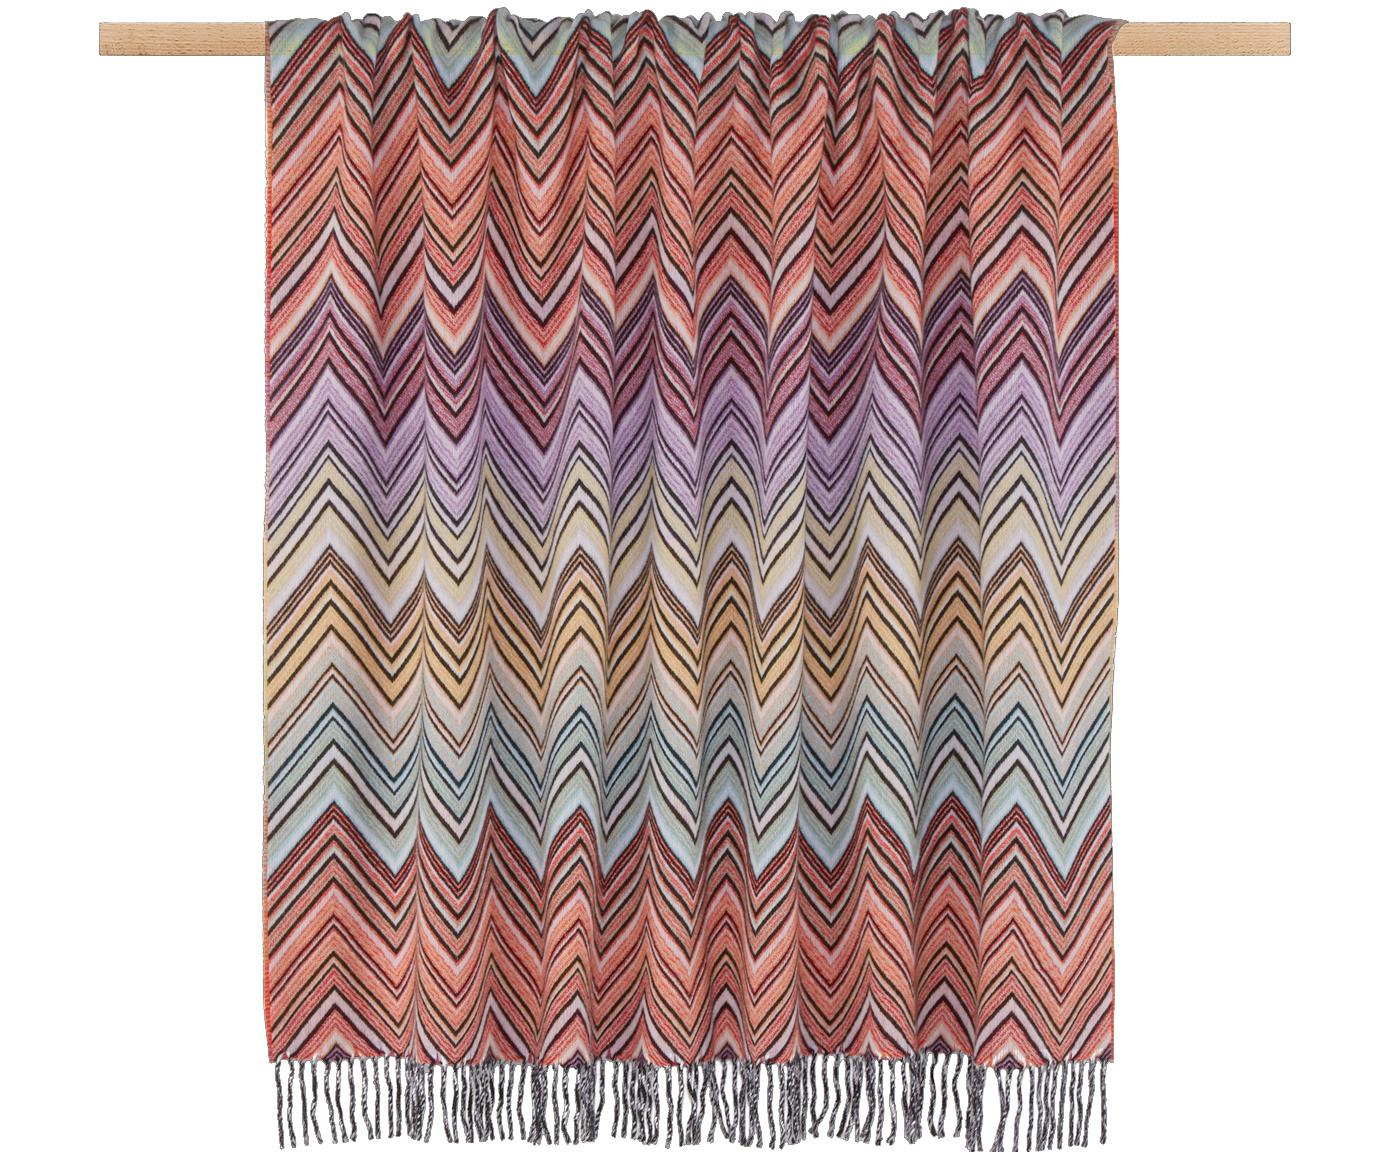 Manta de lana Perseo, 90% lana, 10% cachemir, Naranja, multicolor, An 130 x L 190 cm